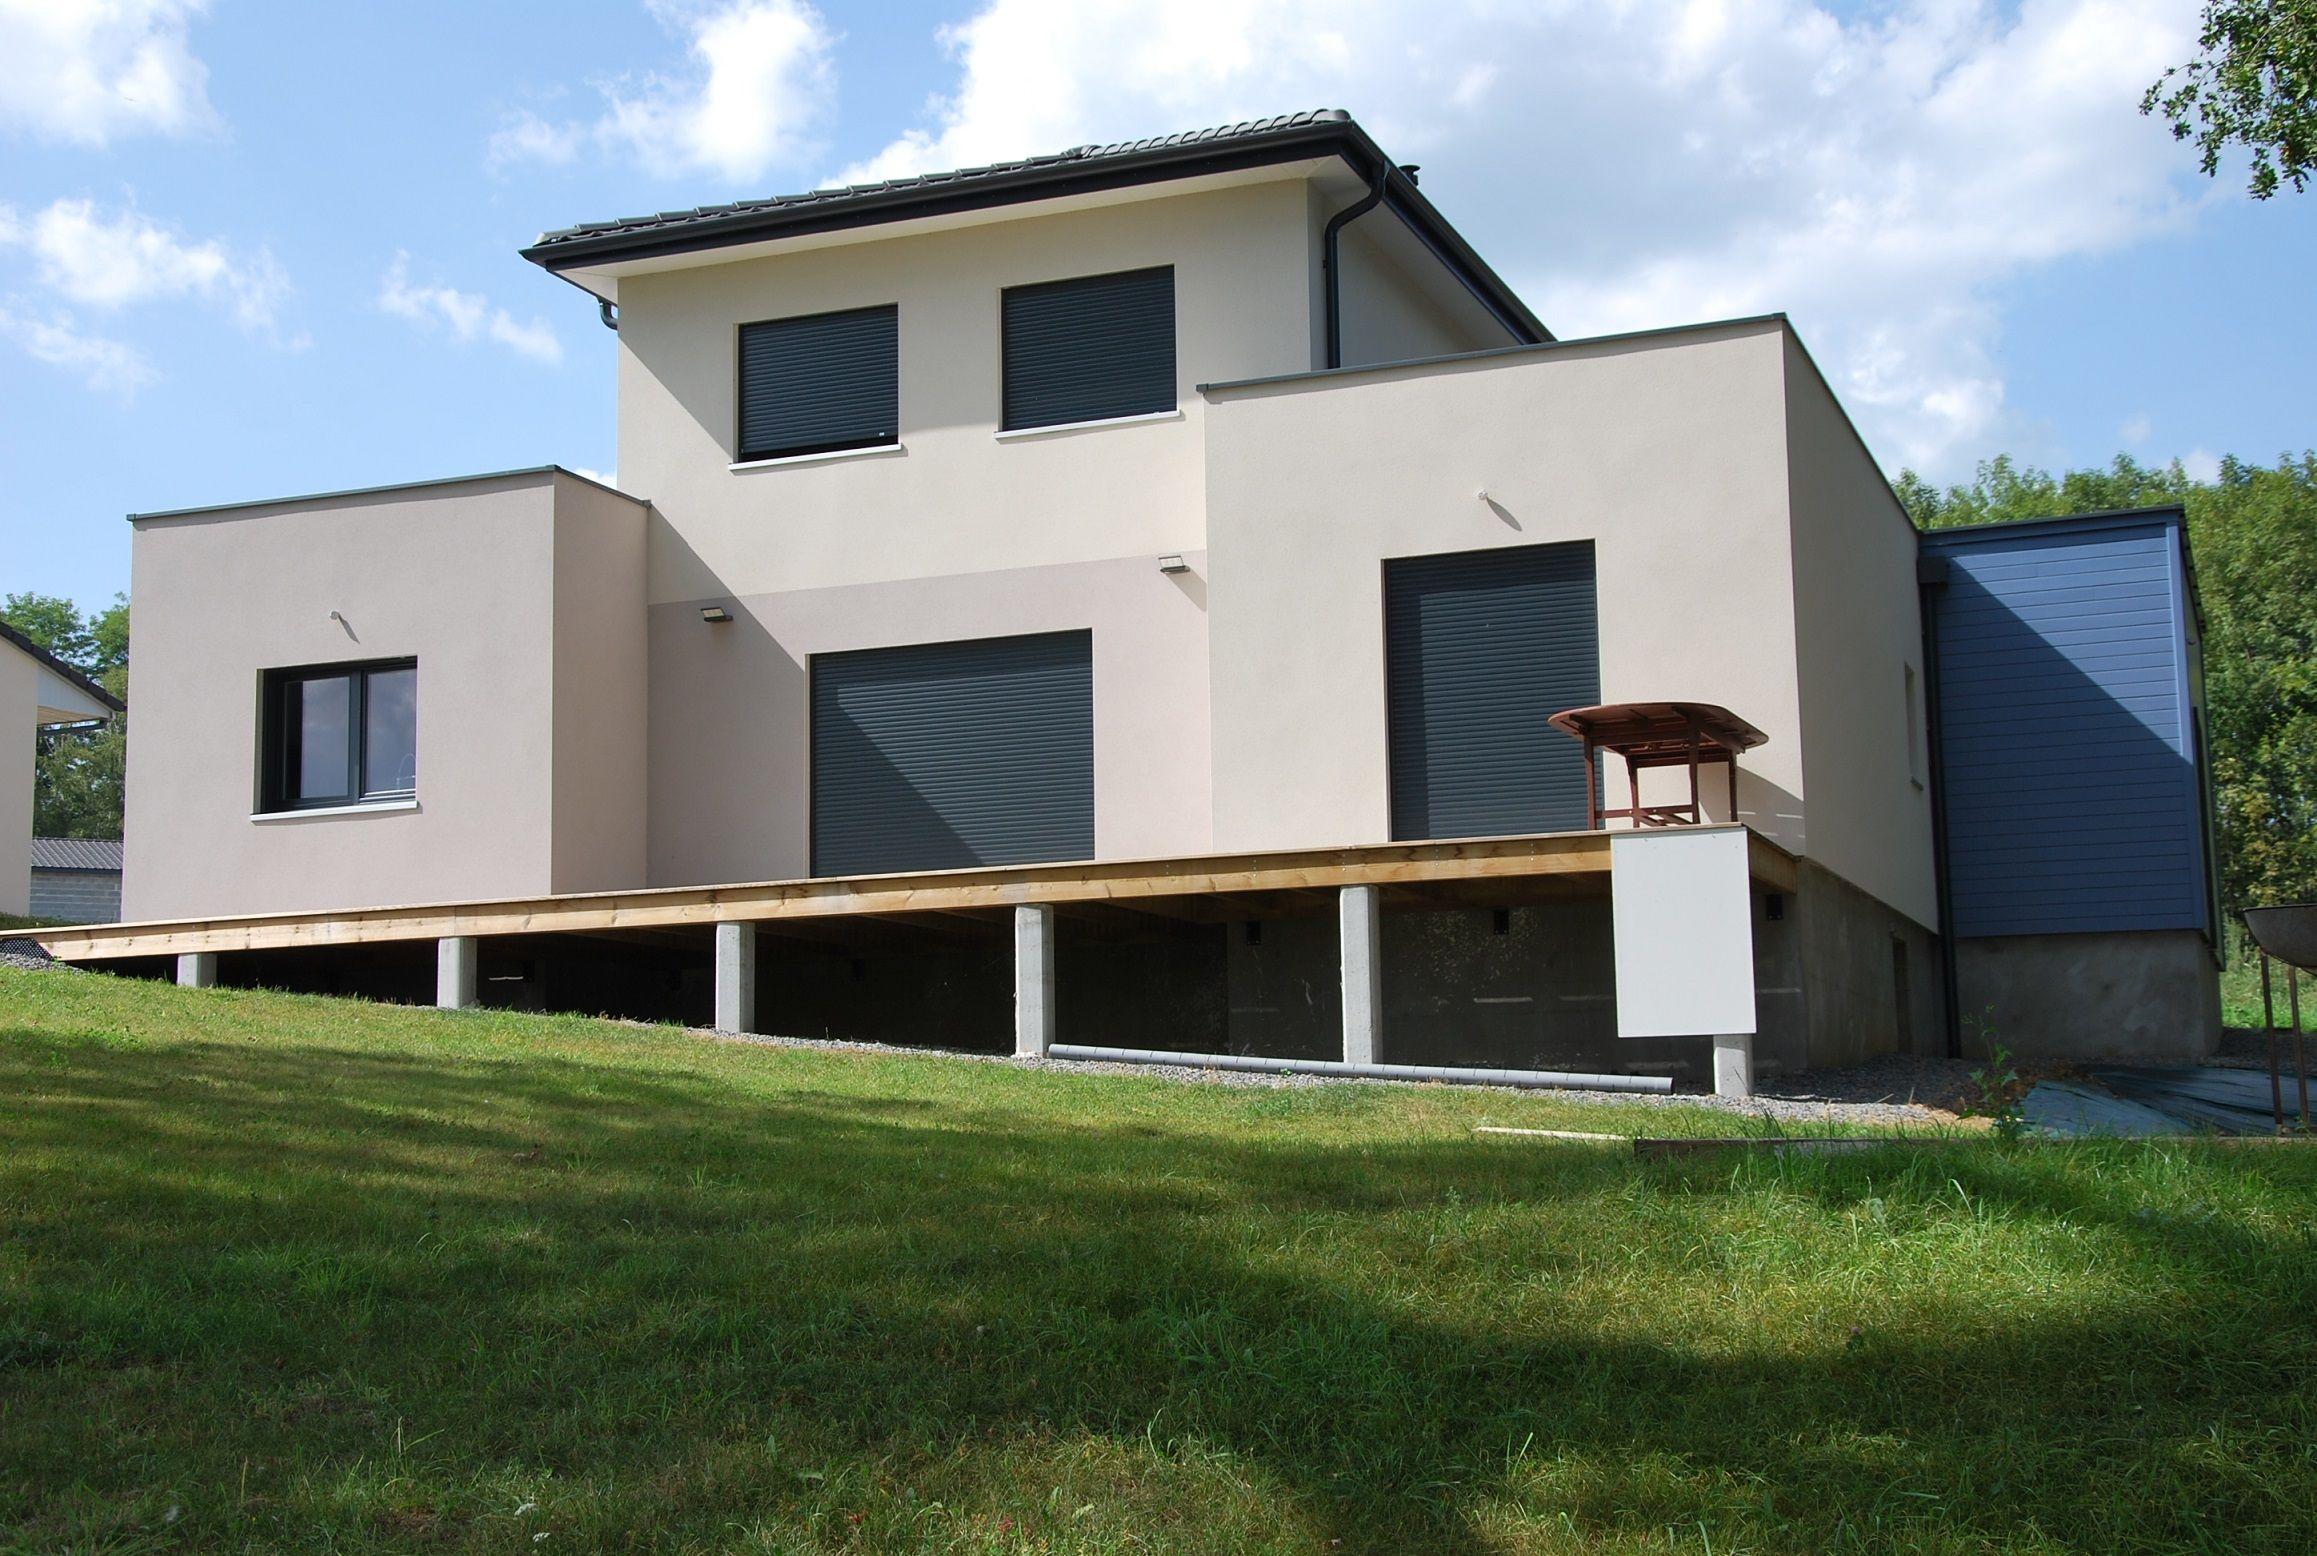 habitation en bois crépi